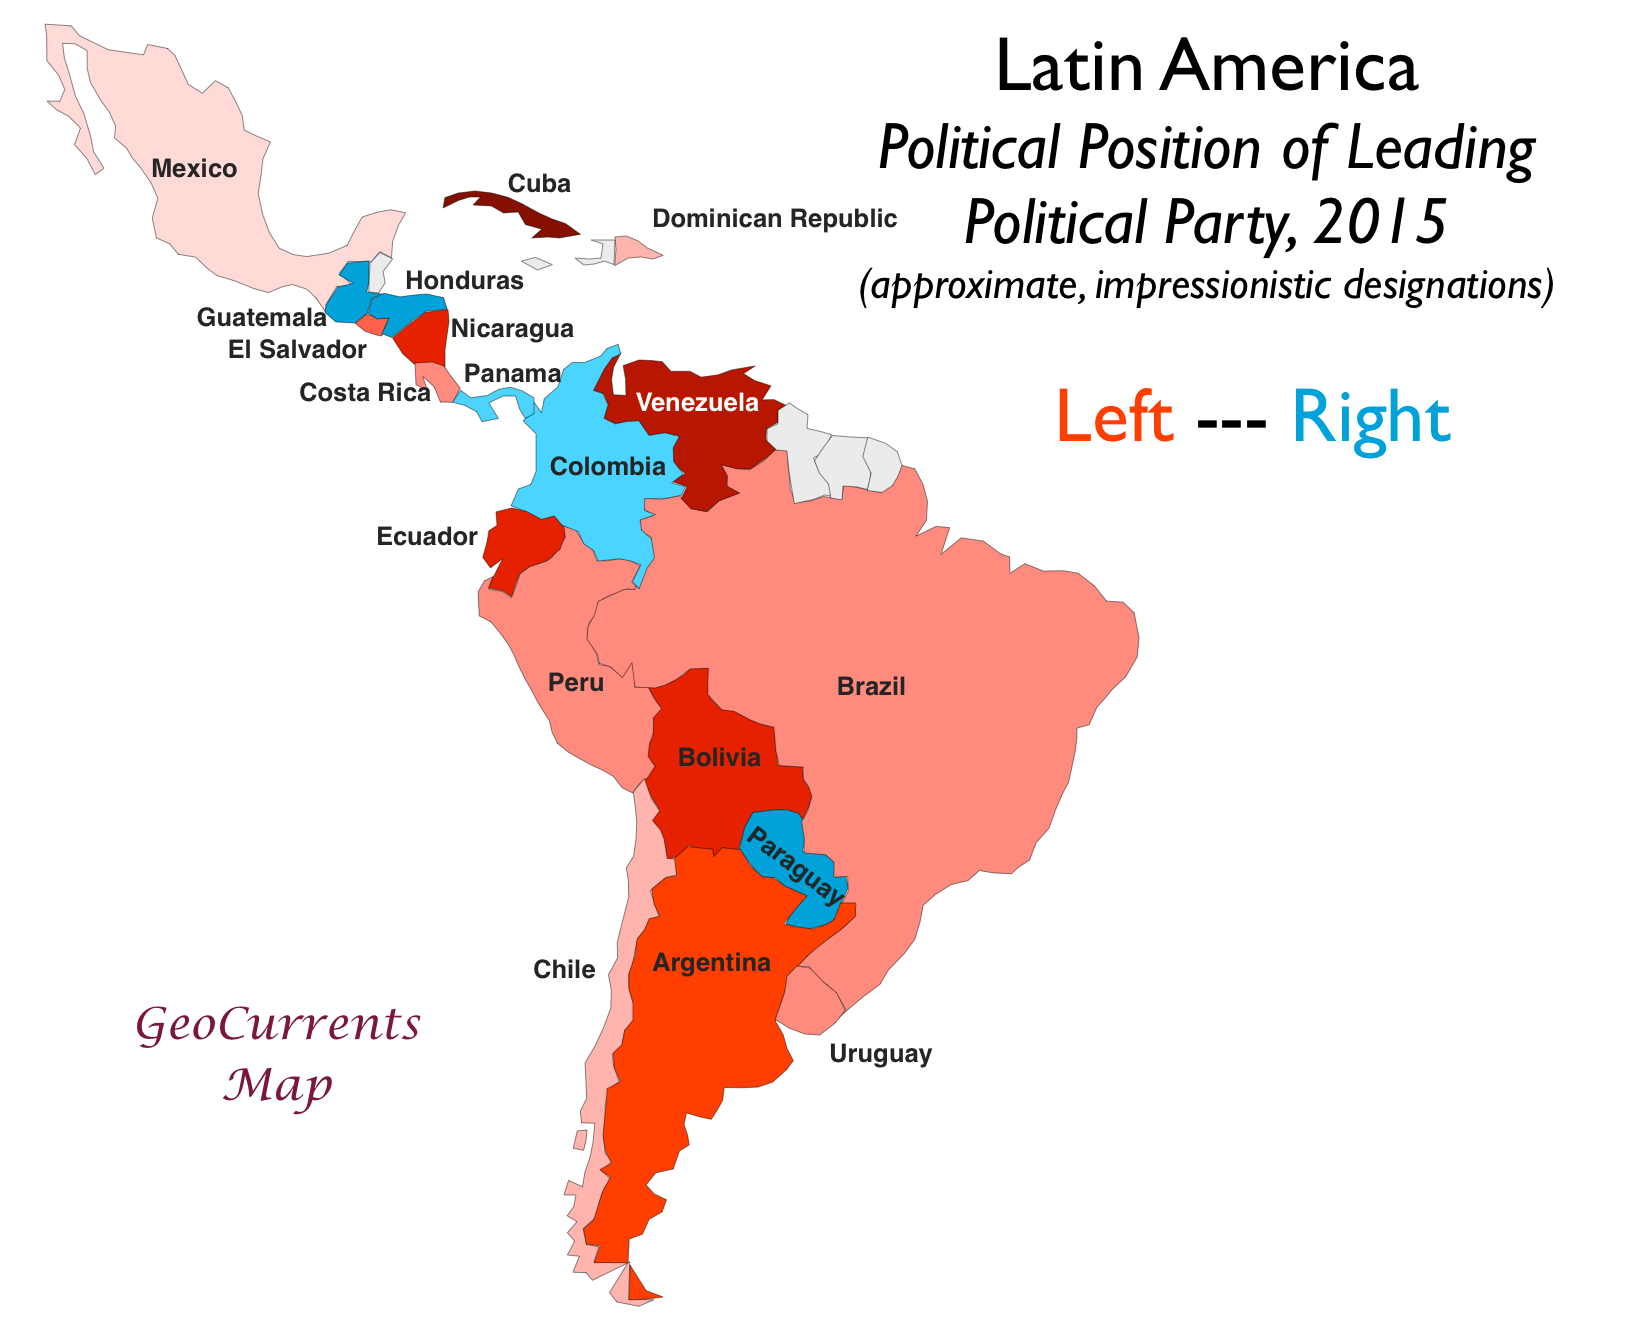 Latin America Map Attempts to Map Latin America's Political Spectrum | GeoCurrents Latin America Map